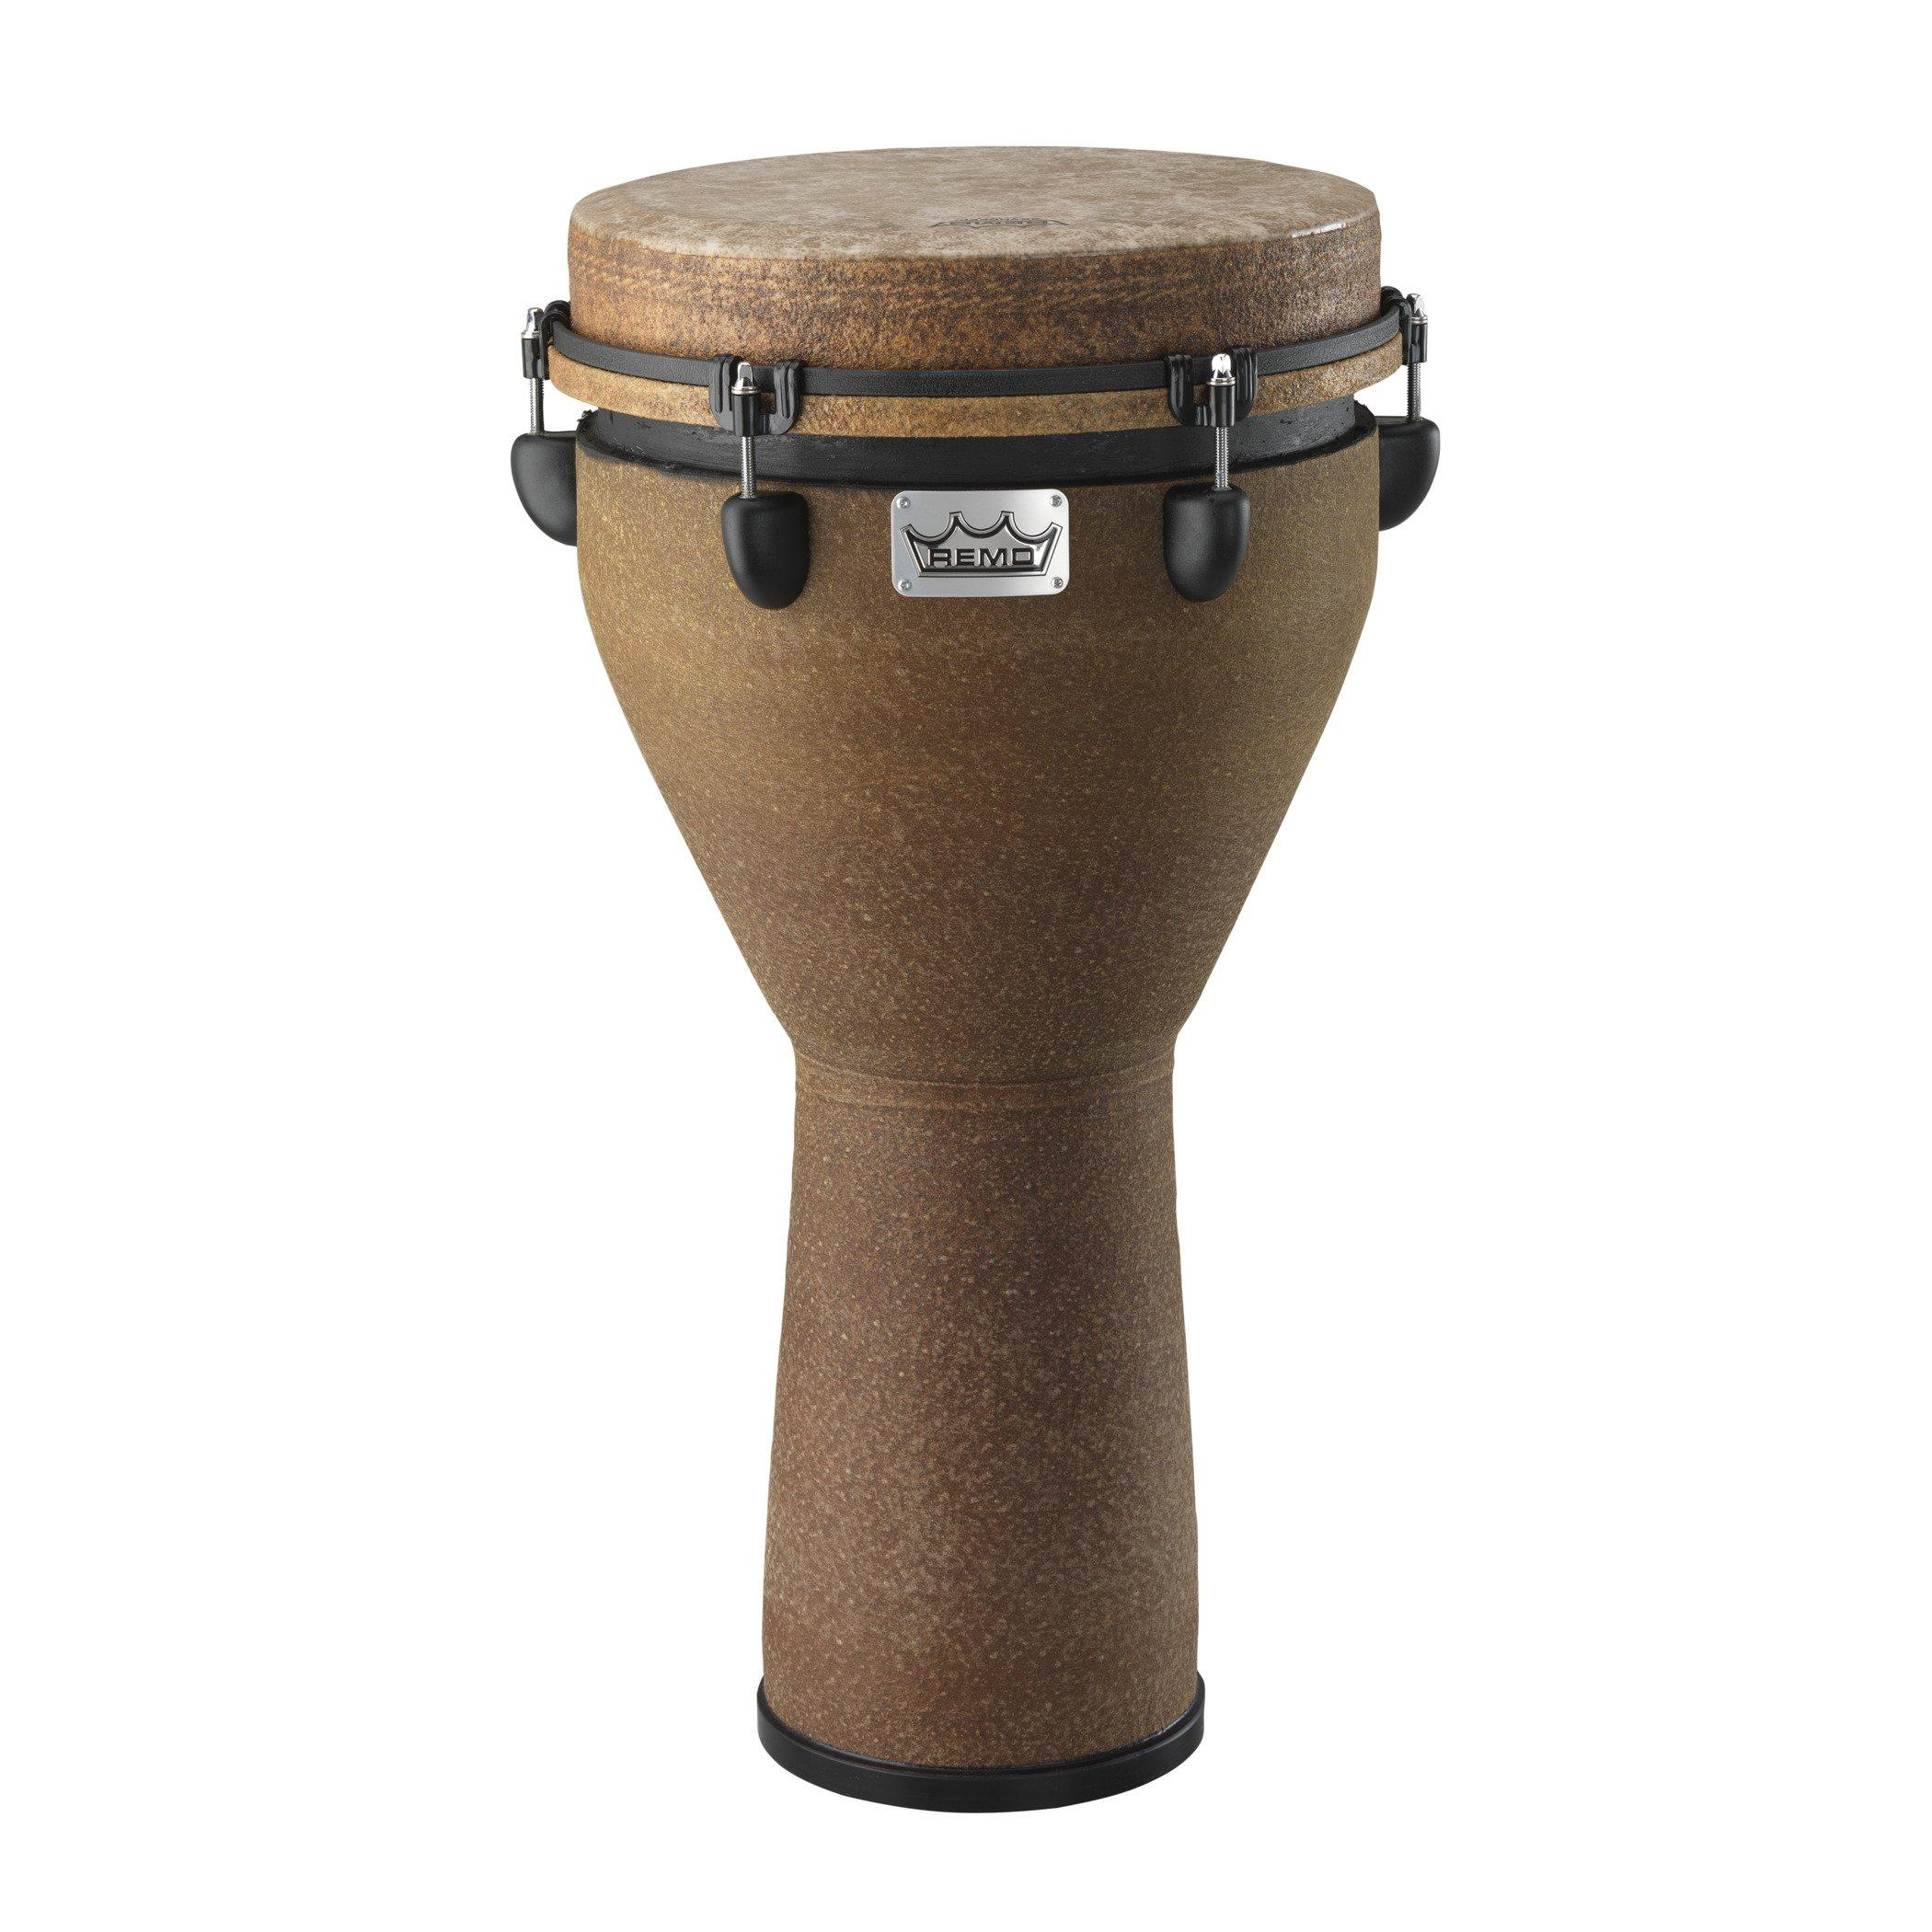 Remo DJ-0012-05 Mondo Djembe Drum - Earth, 12''